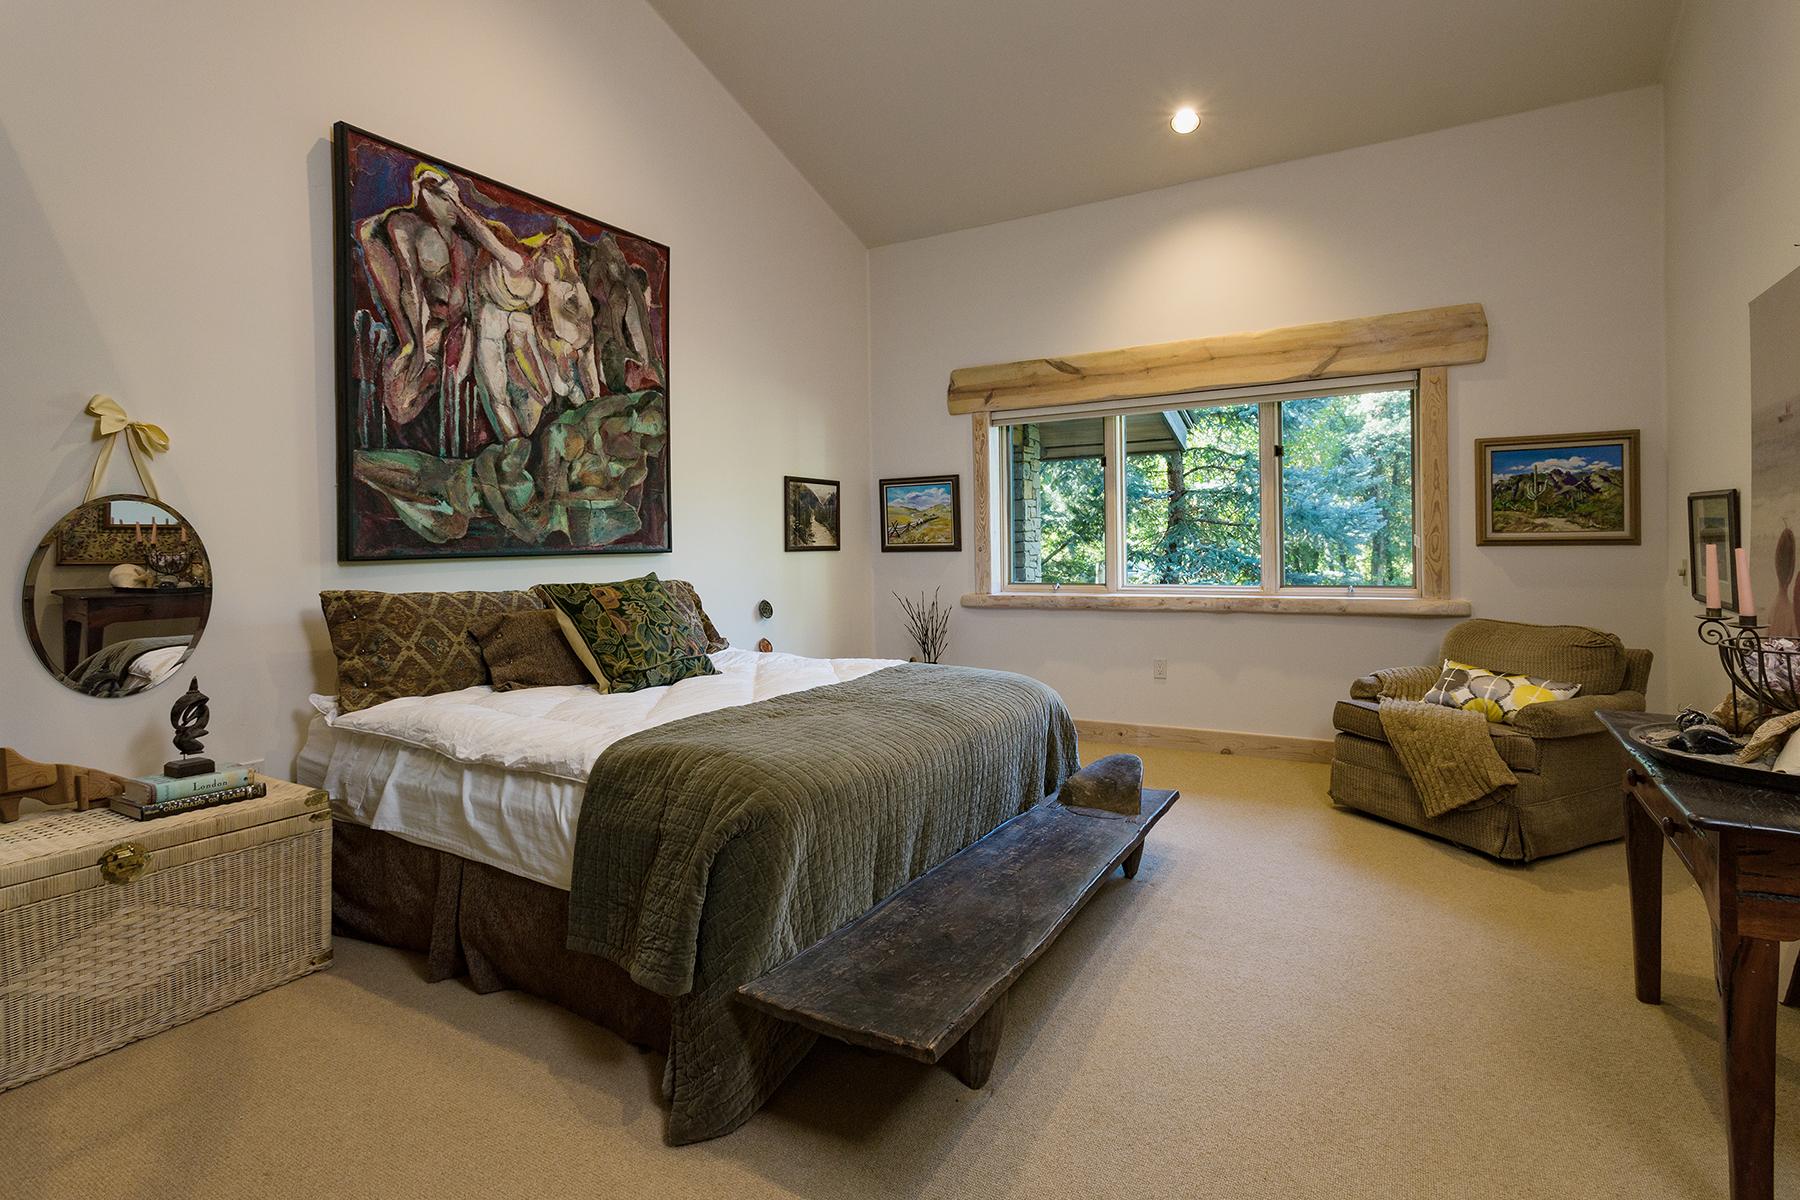 Additional photo for property listing at 47 Mason Cabin Road 47 Mason Cabin Road Durango, Colorado 81301 United States